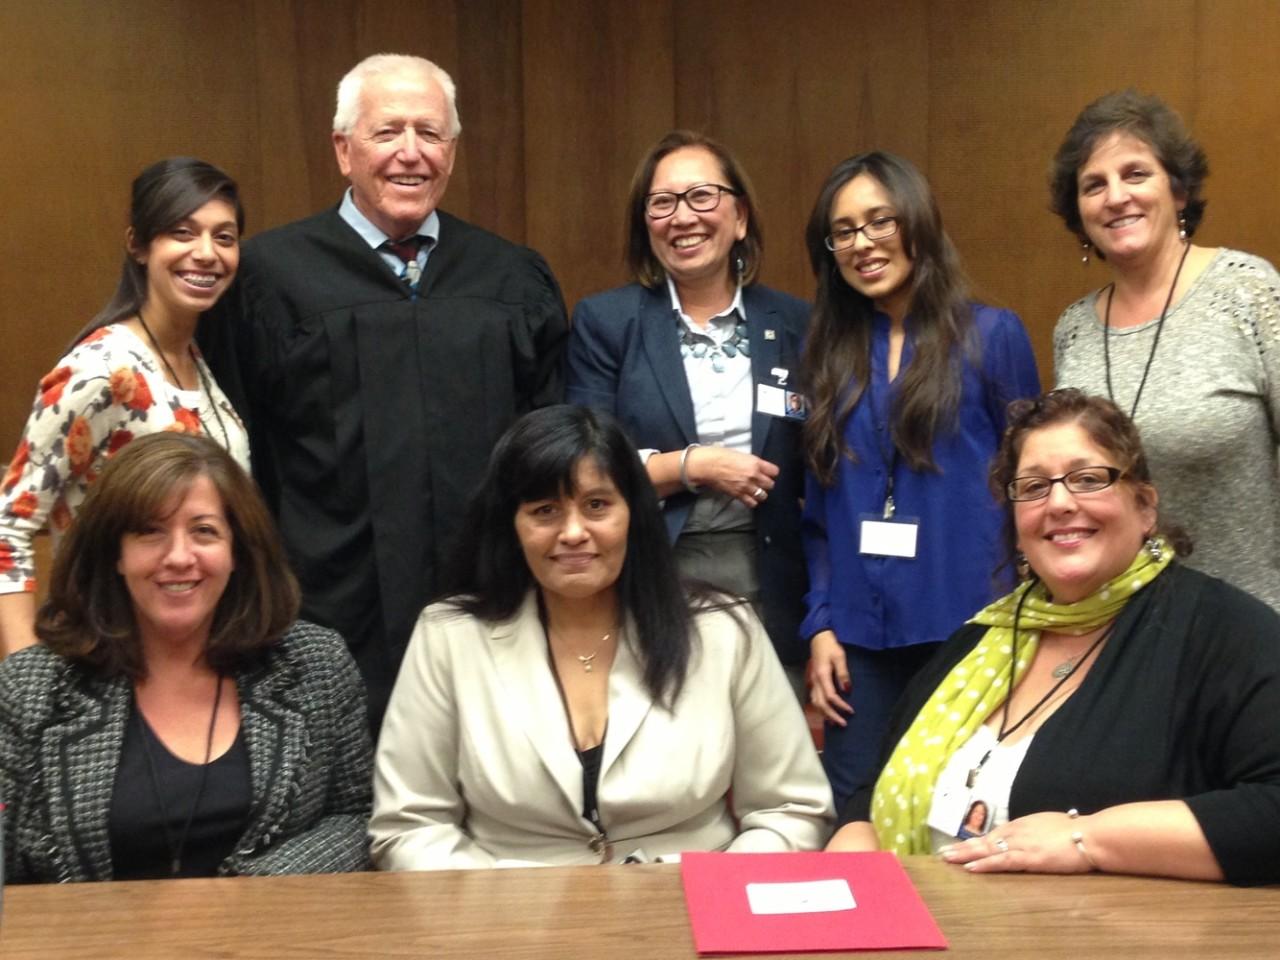 Advocate Swear-Ins